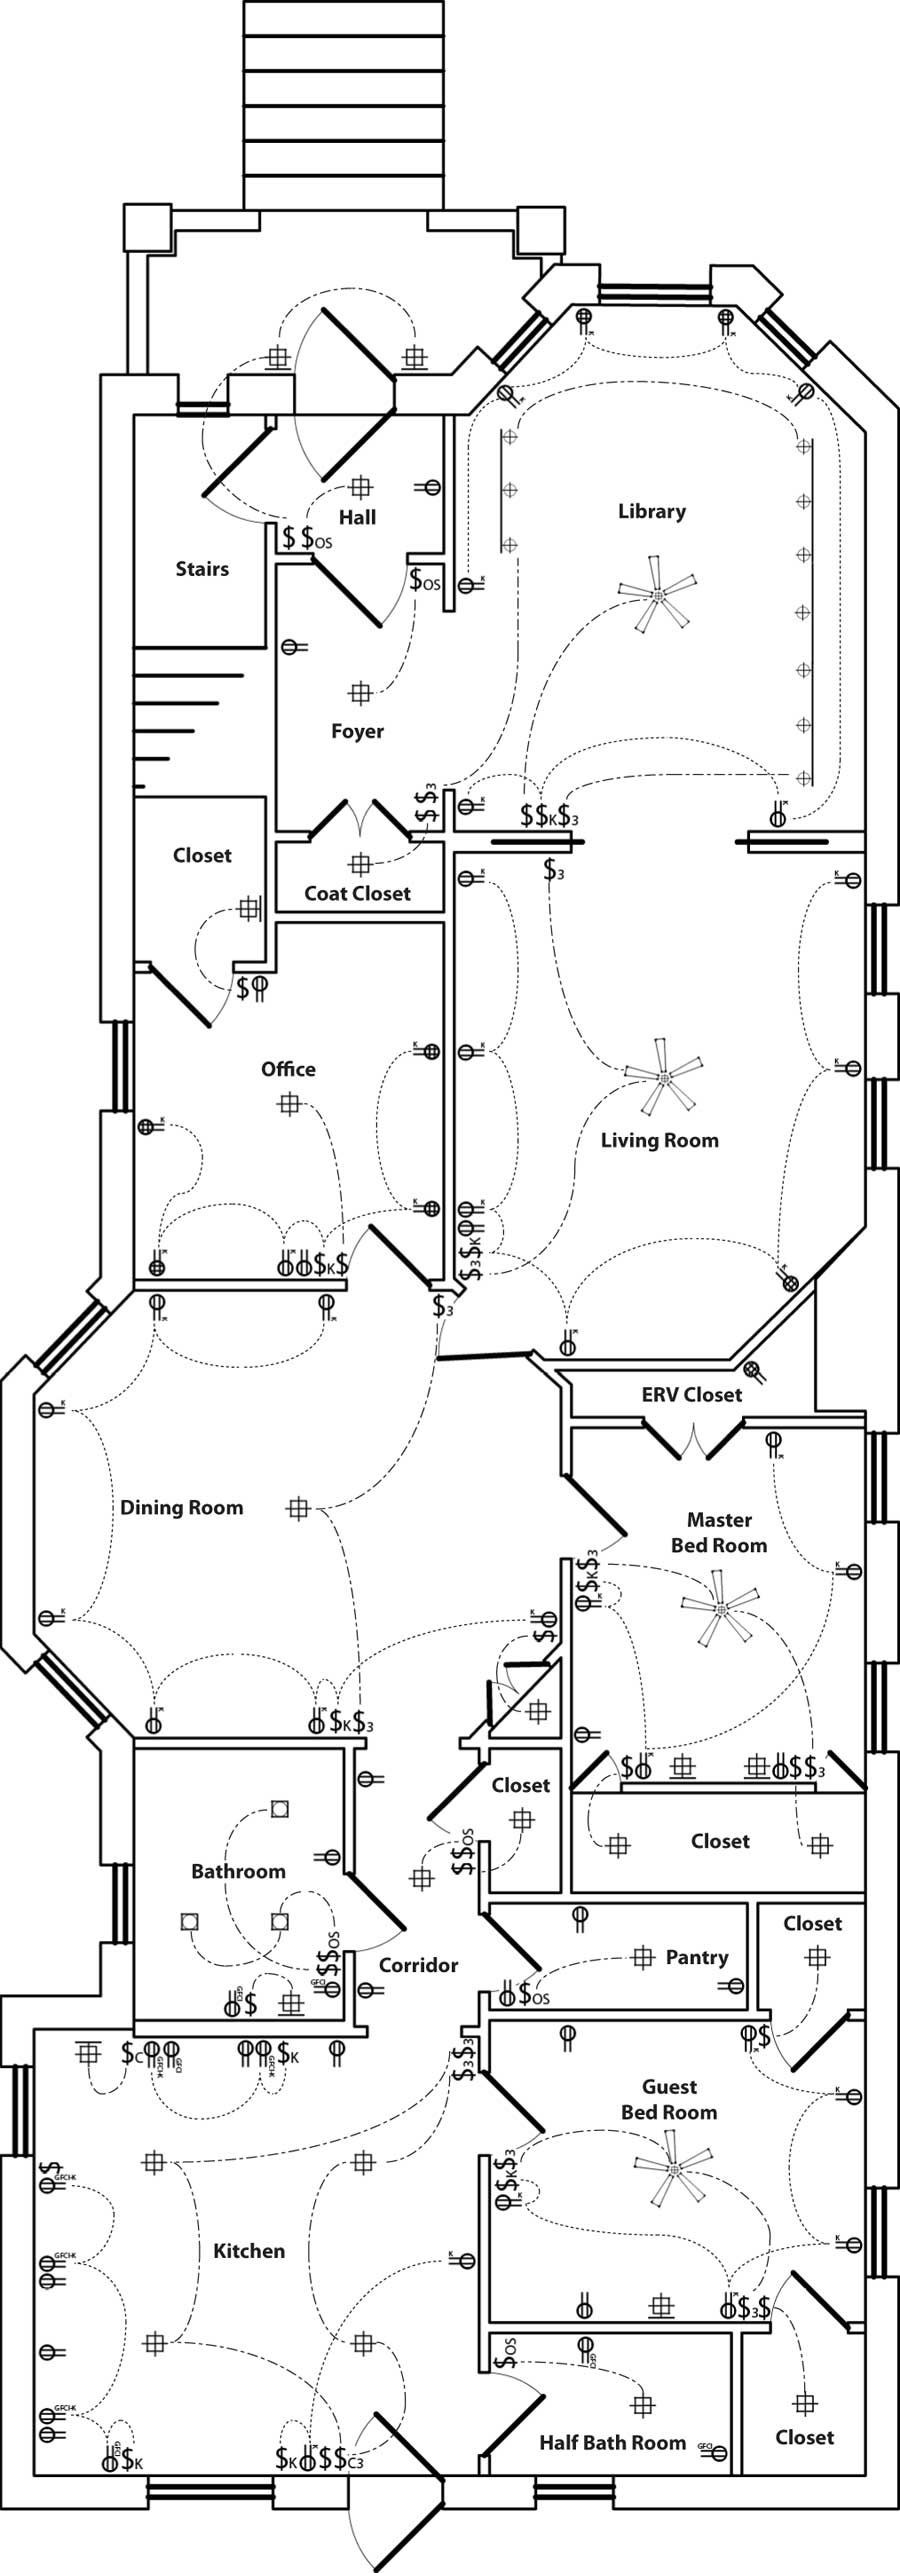 electrical layout – plan view | reshaping our footprint  marcus de la fleur